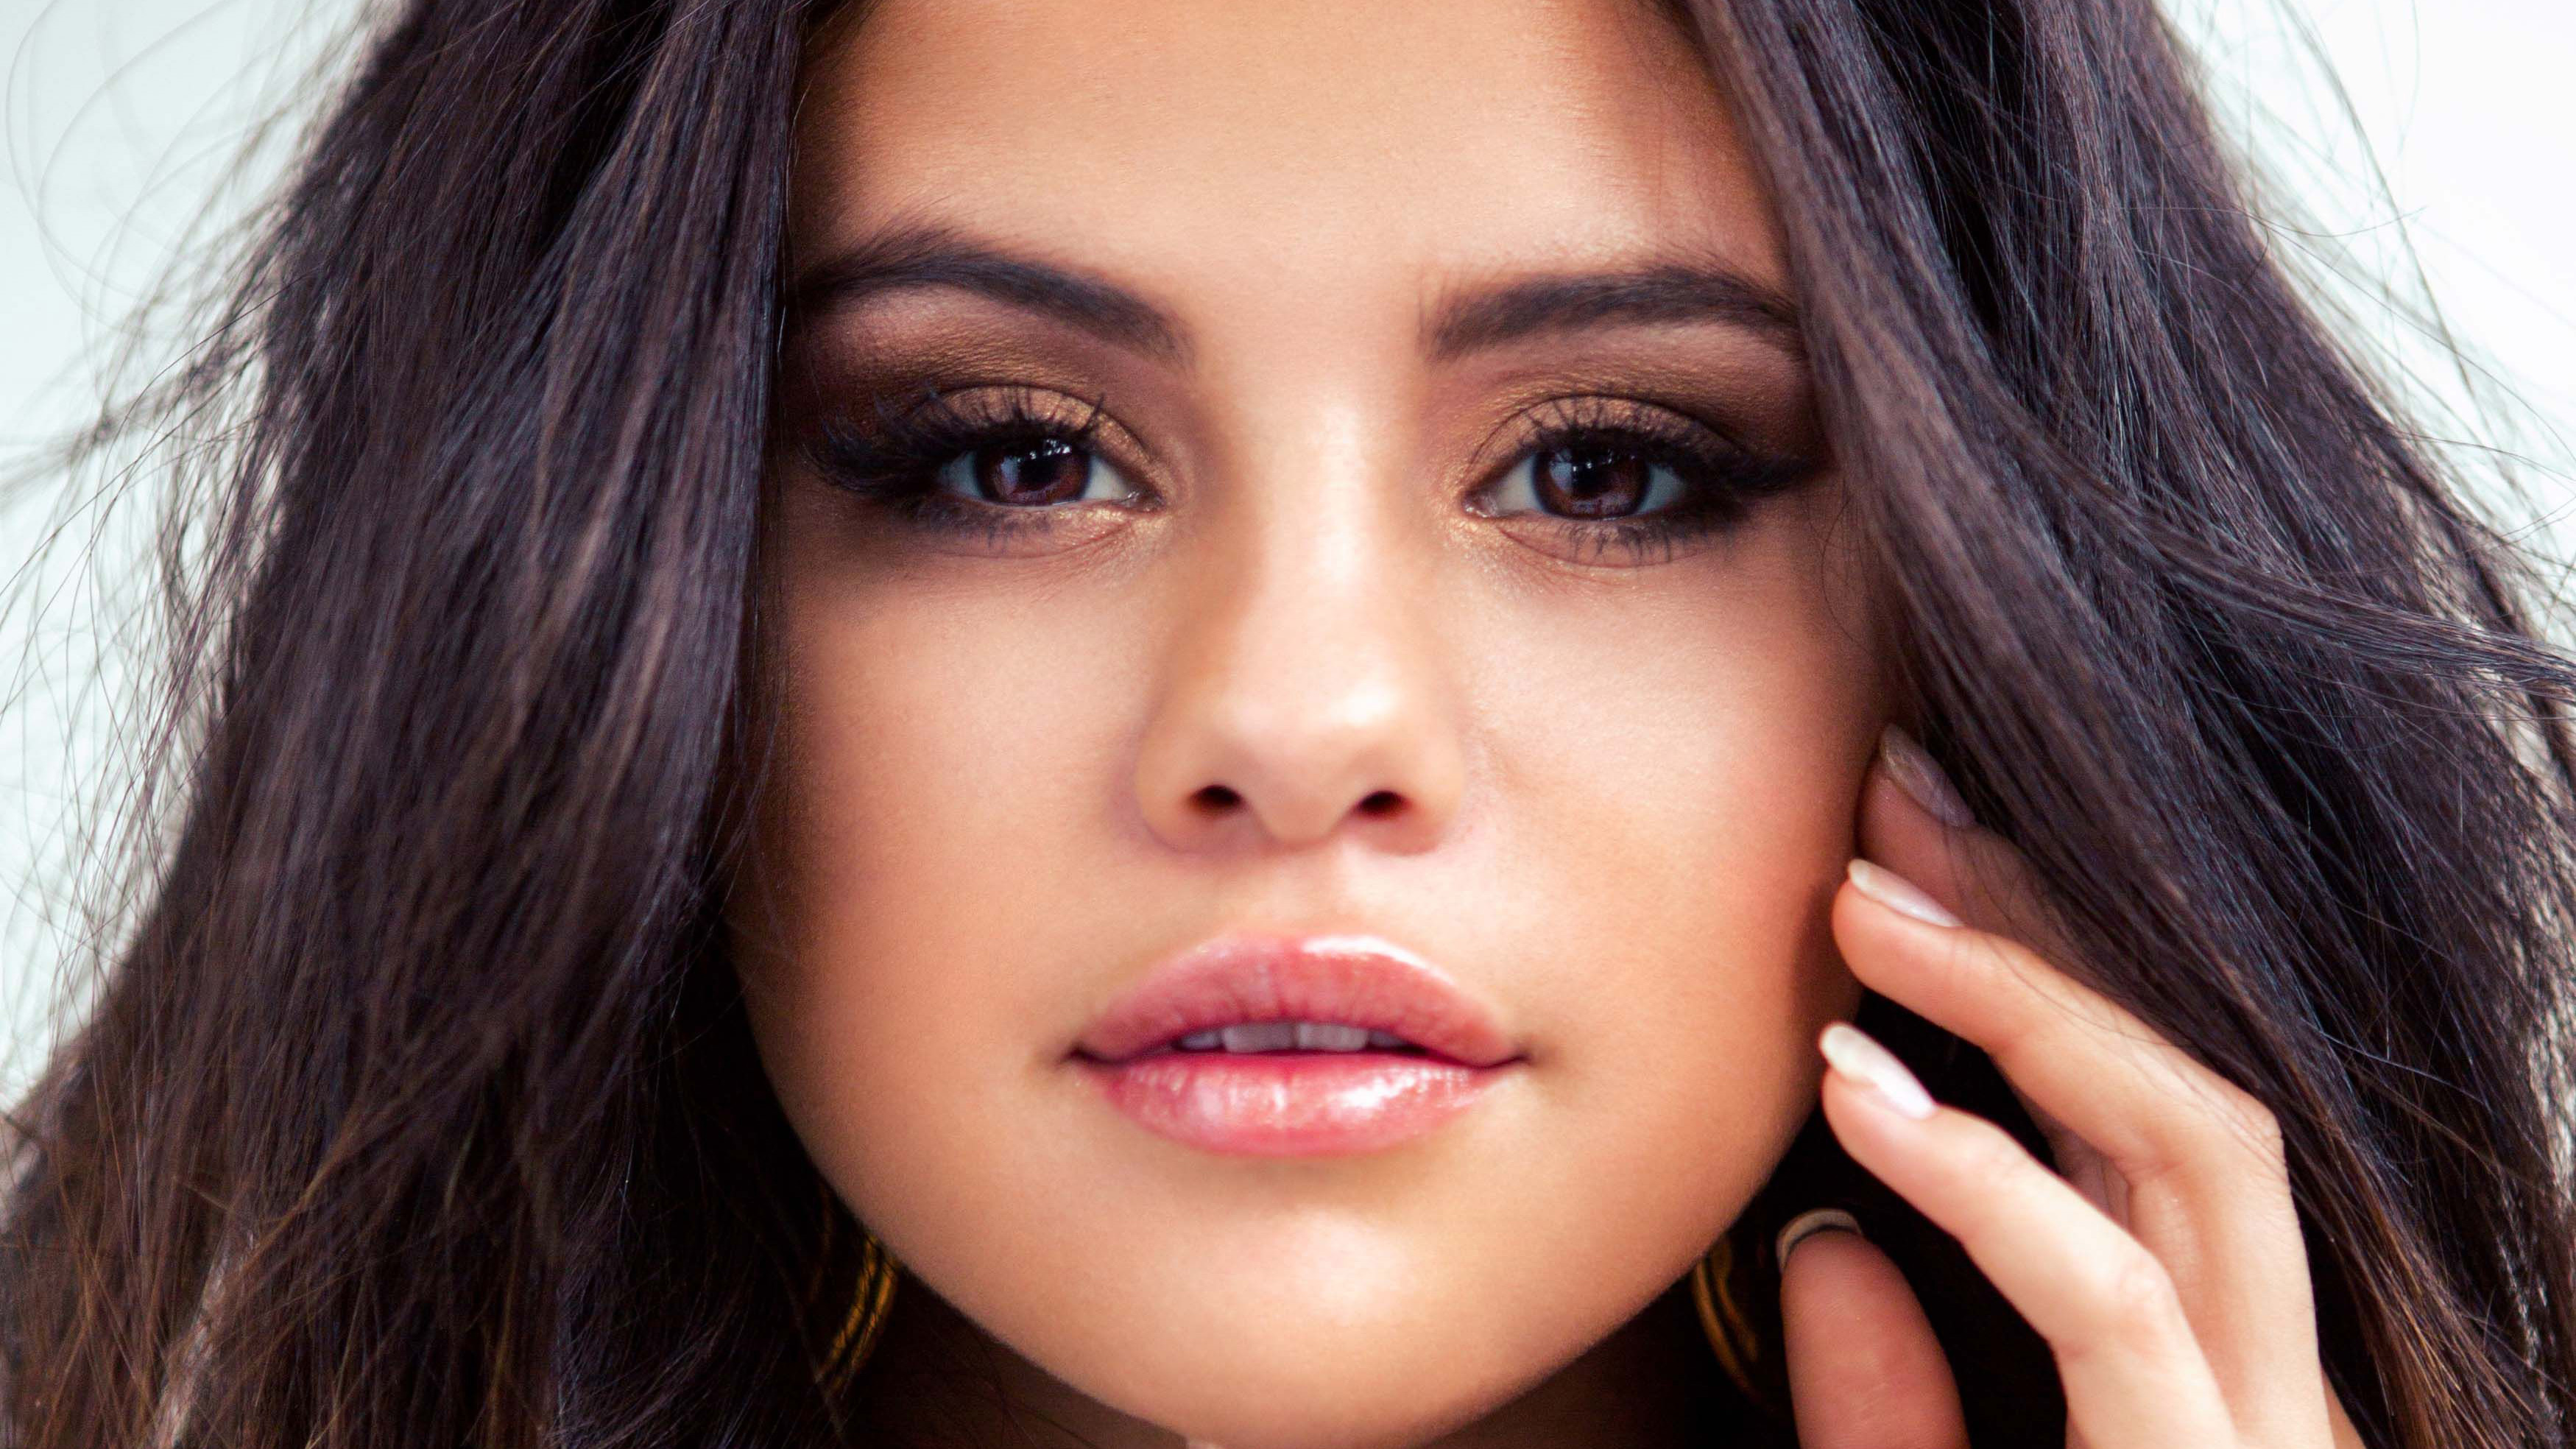 Selena Gomez Face Portrait 4k, HD Music, 4k Wallpapers ...